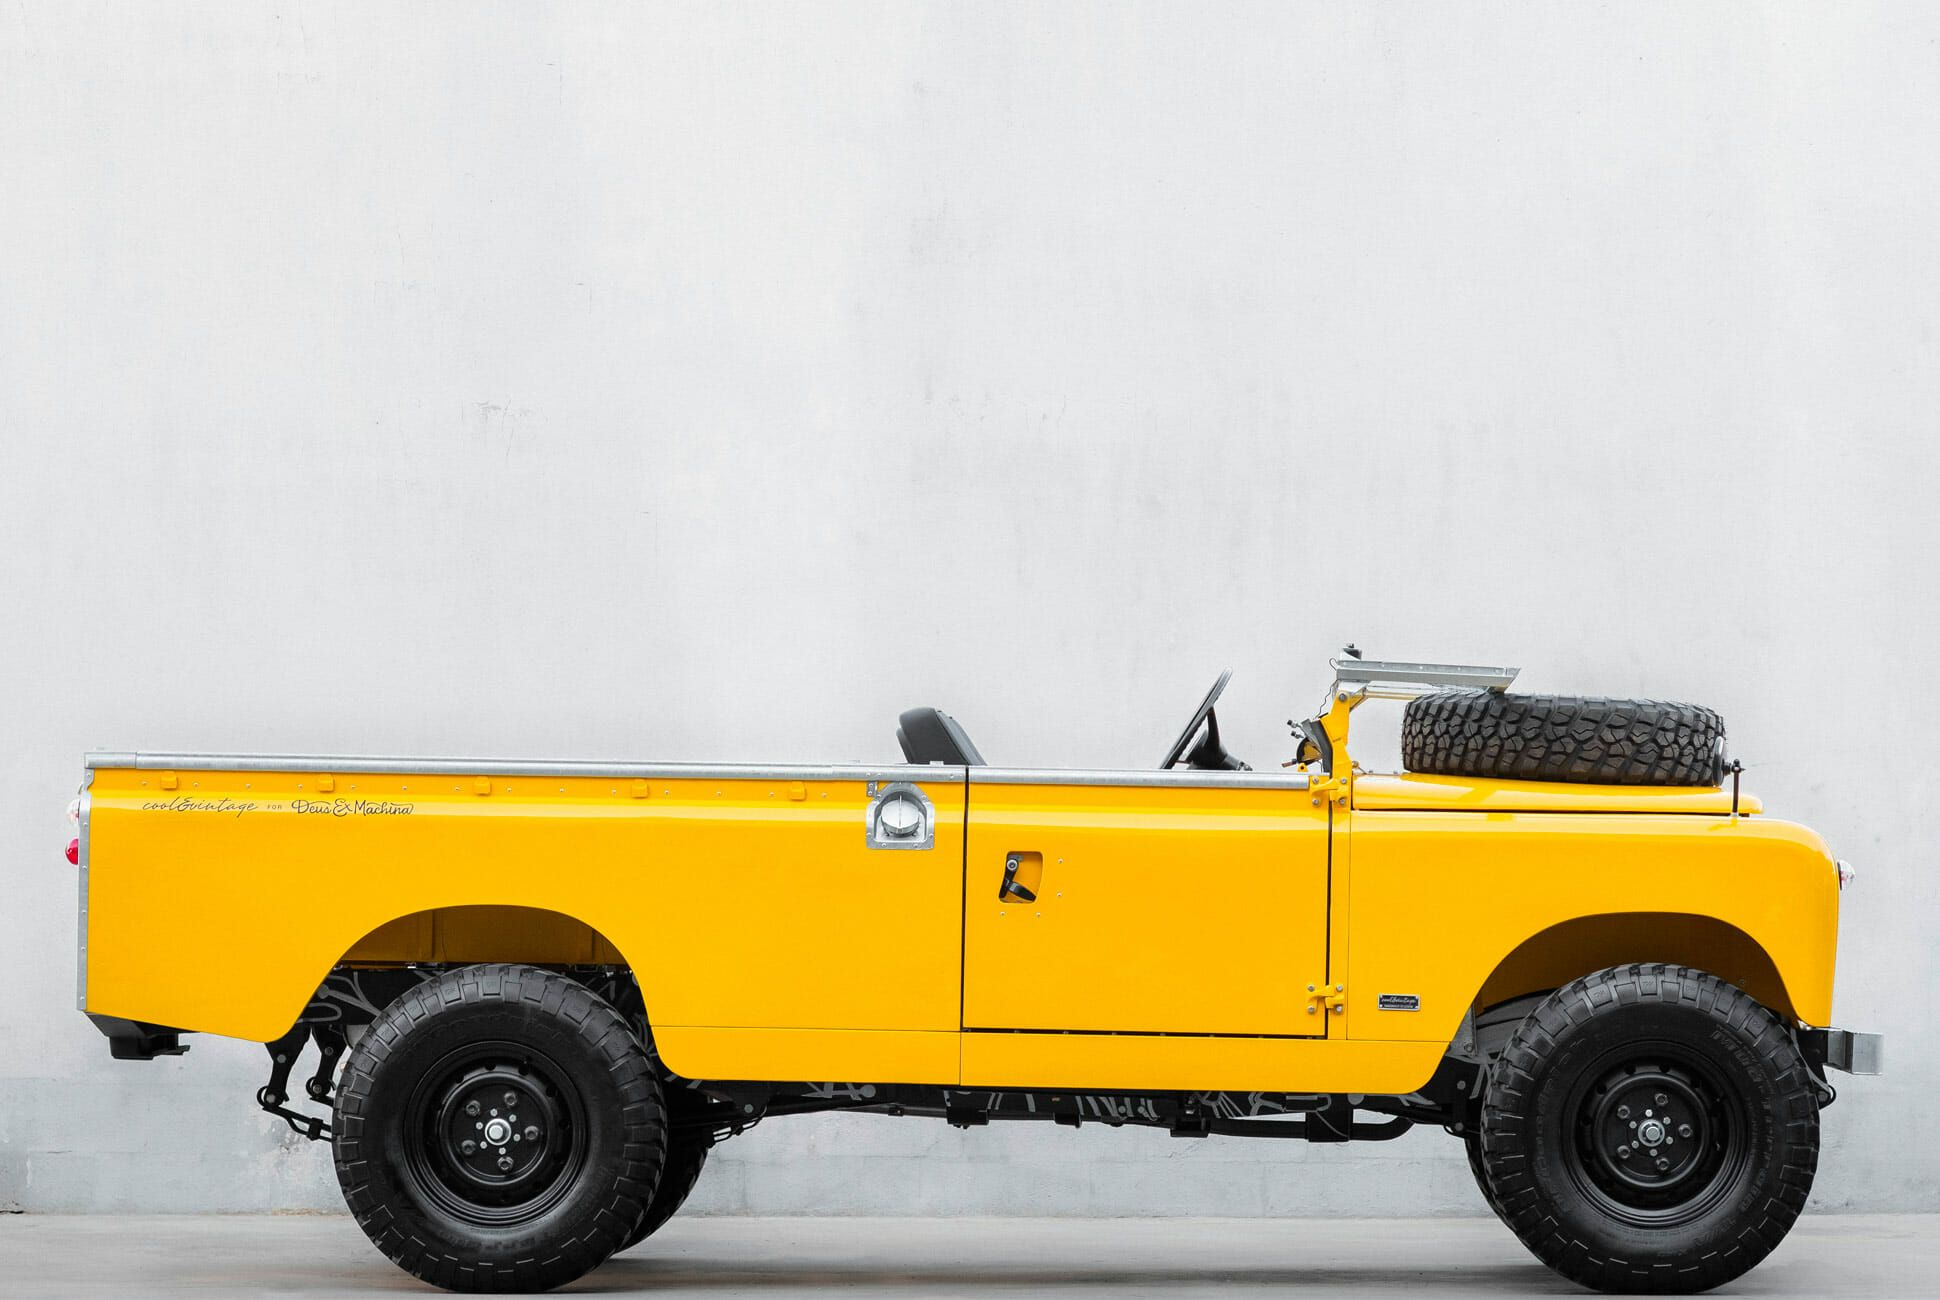 Cool-n-Vintage-x-Deus-Ex-Machina-Land-Rover-Yellow-Landmarine-gear-patrol-slide-3